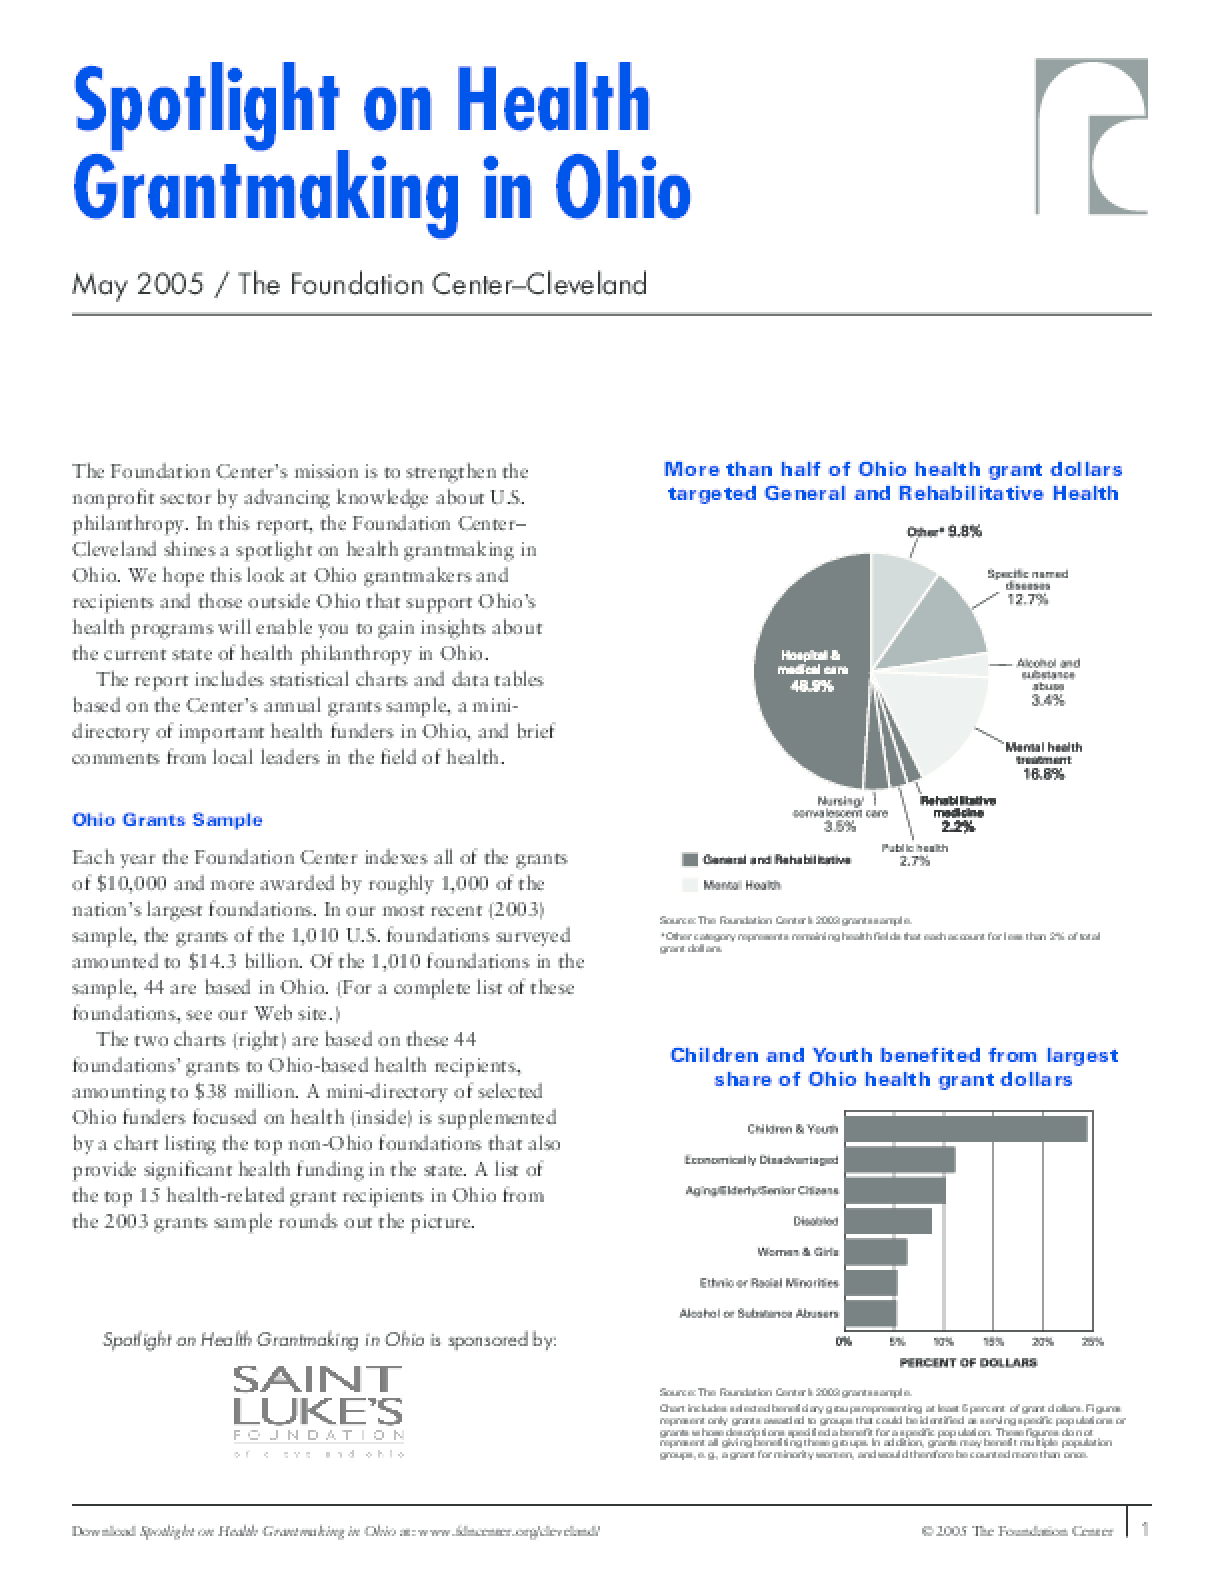 Spotlight on Health Grantmaking in Ohio 2005